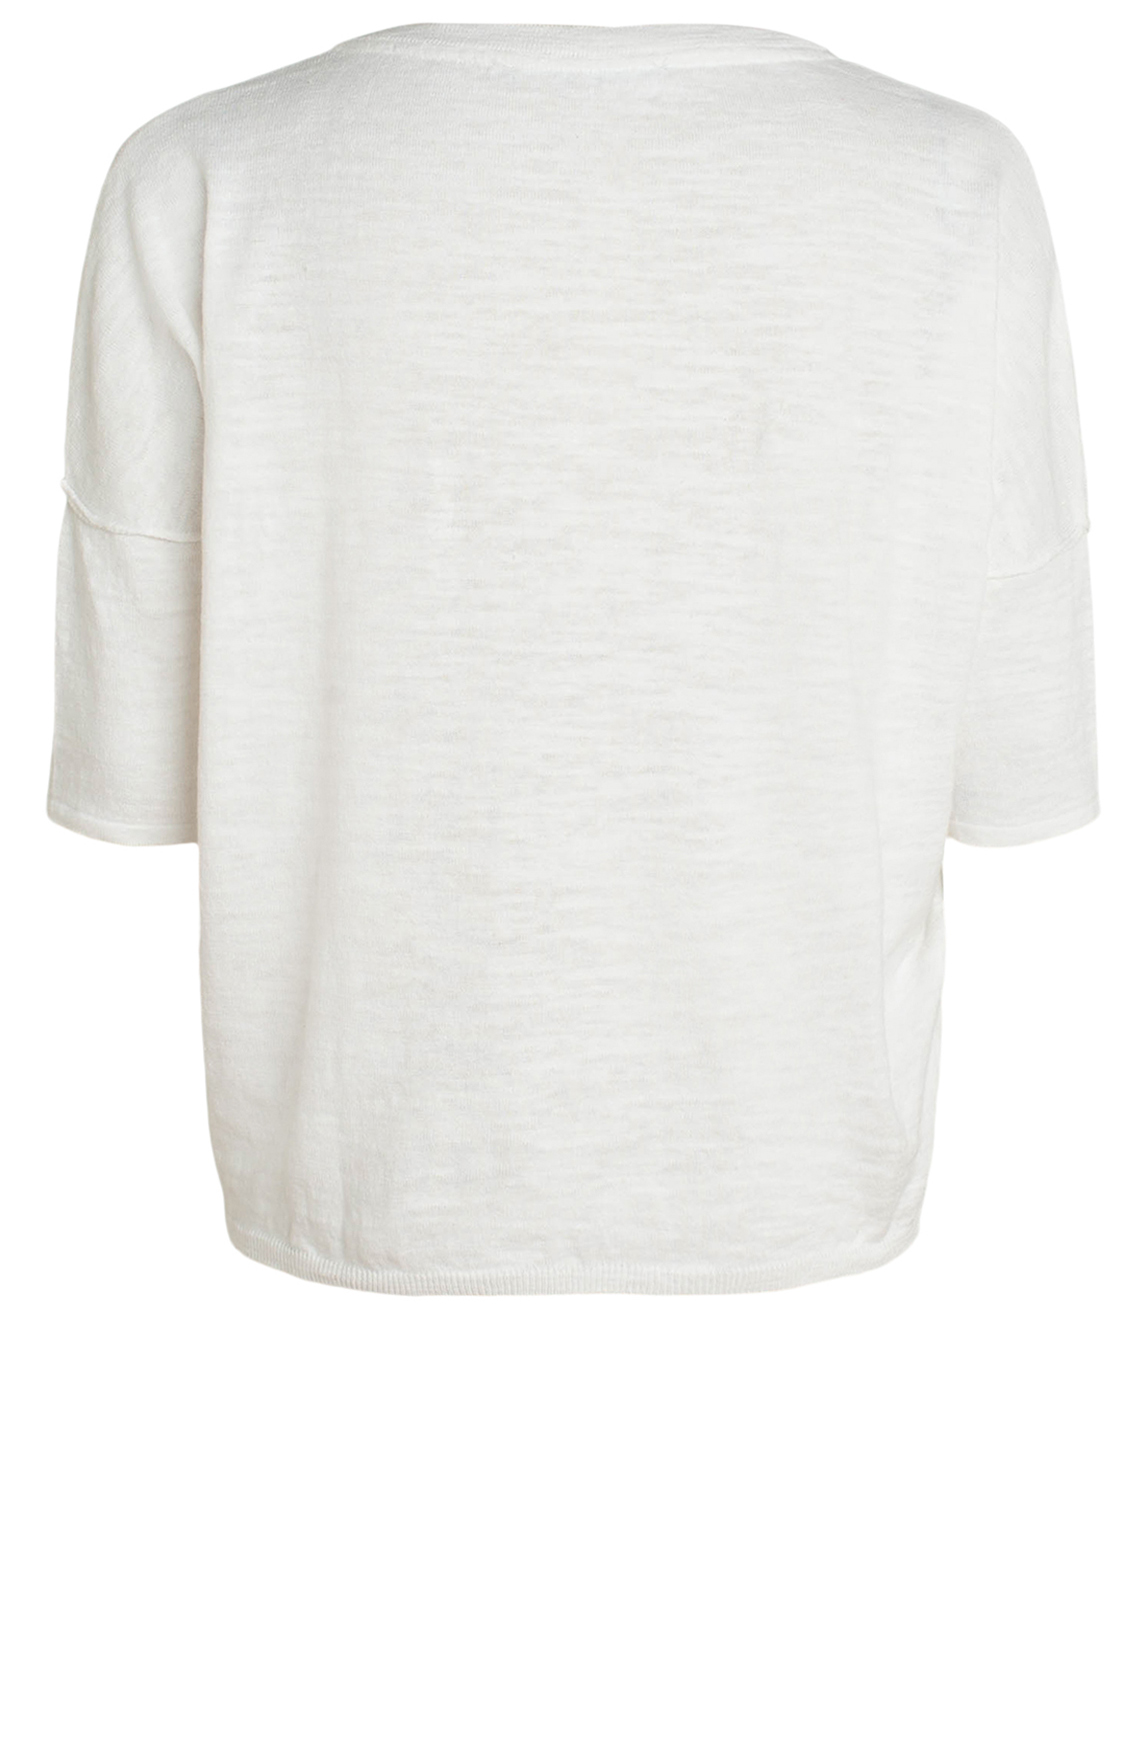 Moscow Dames Shirt met linnen wit